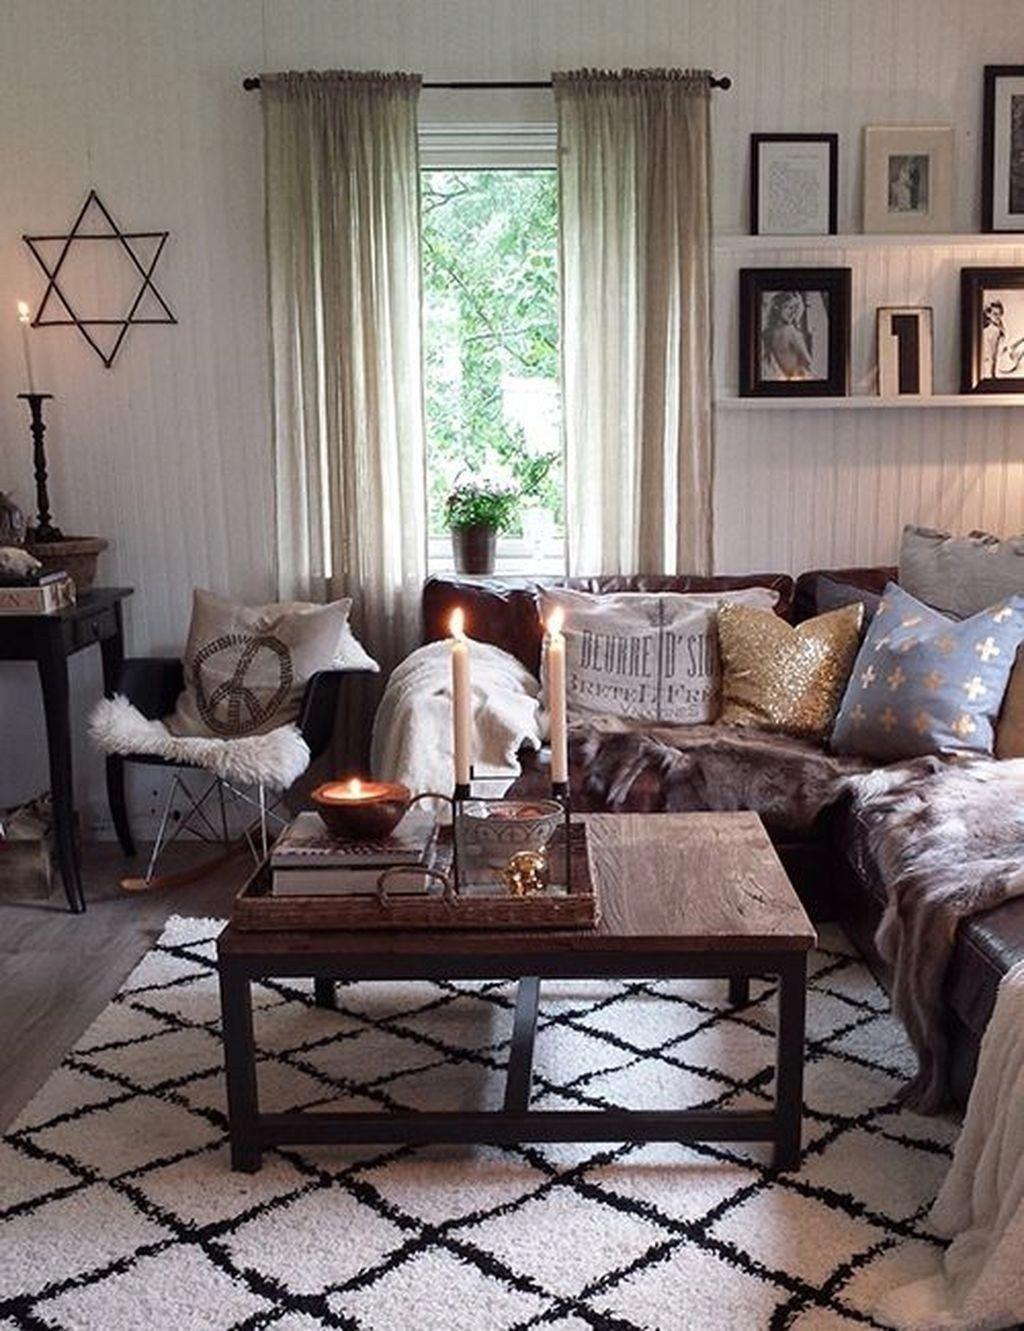 50 Cool Brown Sofa Ideas For Living Room Decor Brown Sofa Decor Brown Couch Living Room Brown Couch Decor